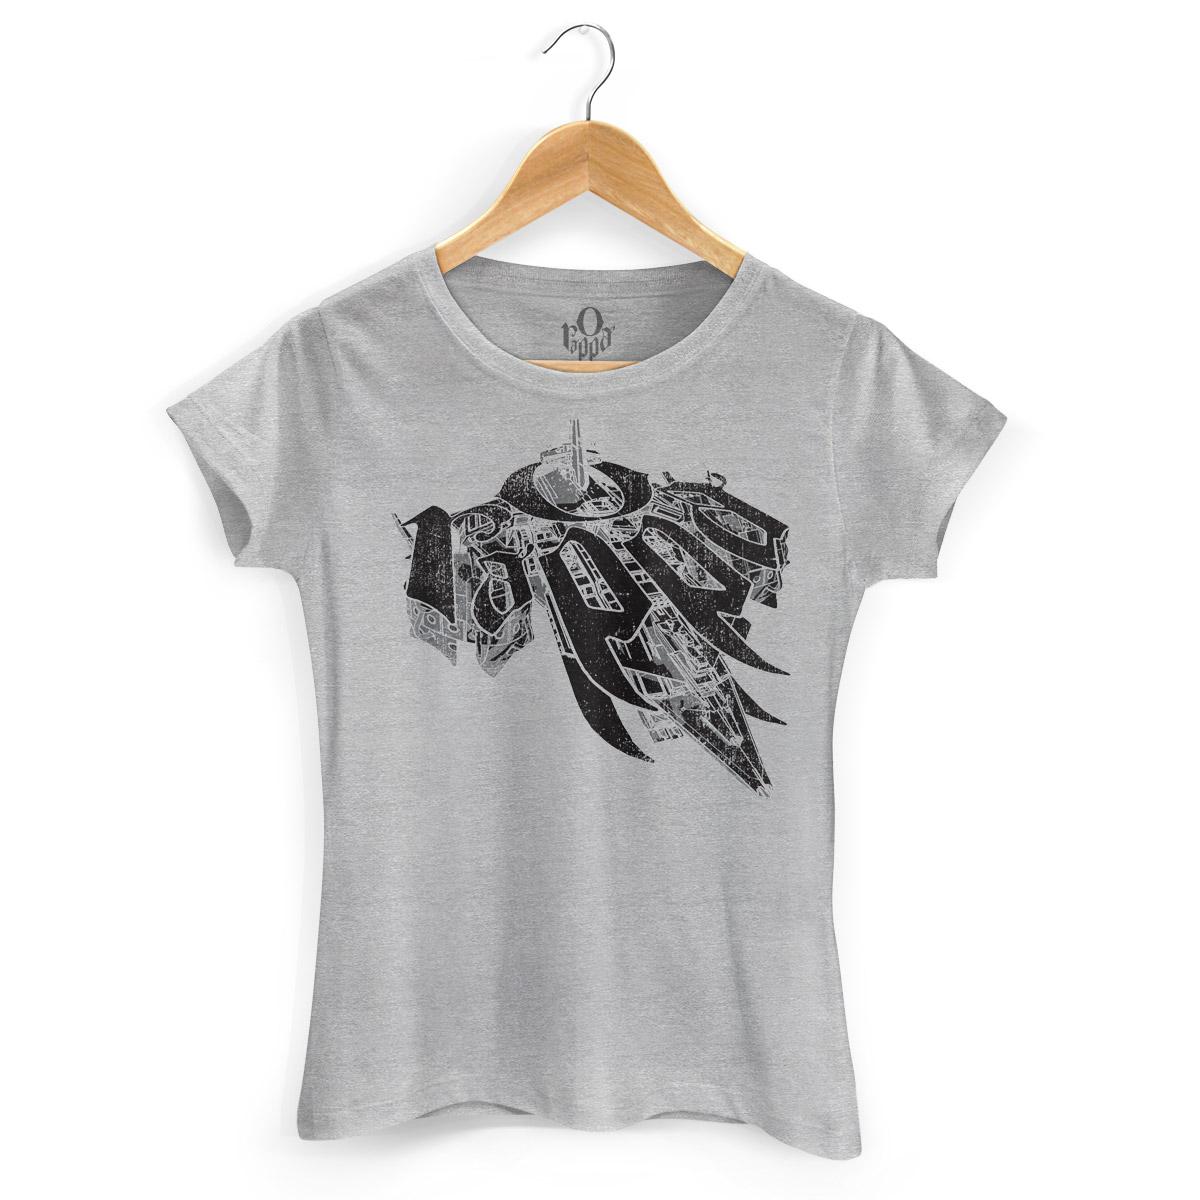 Camiseta Feminina O Rappa Nunca Tem Fim